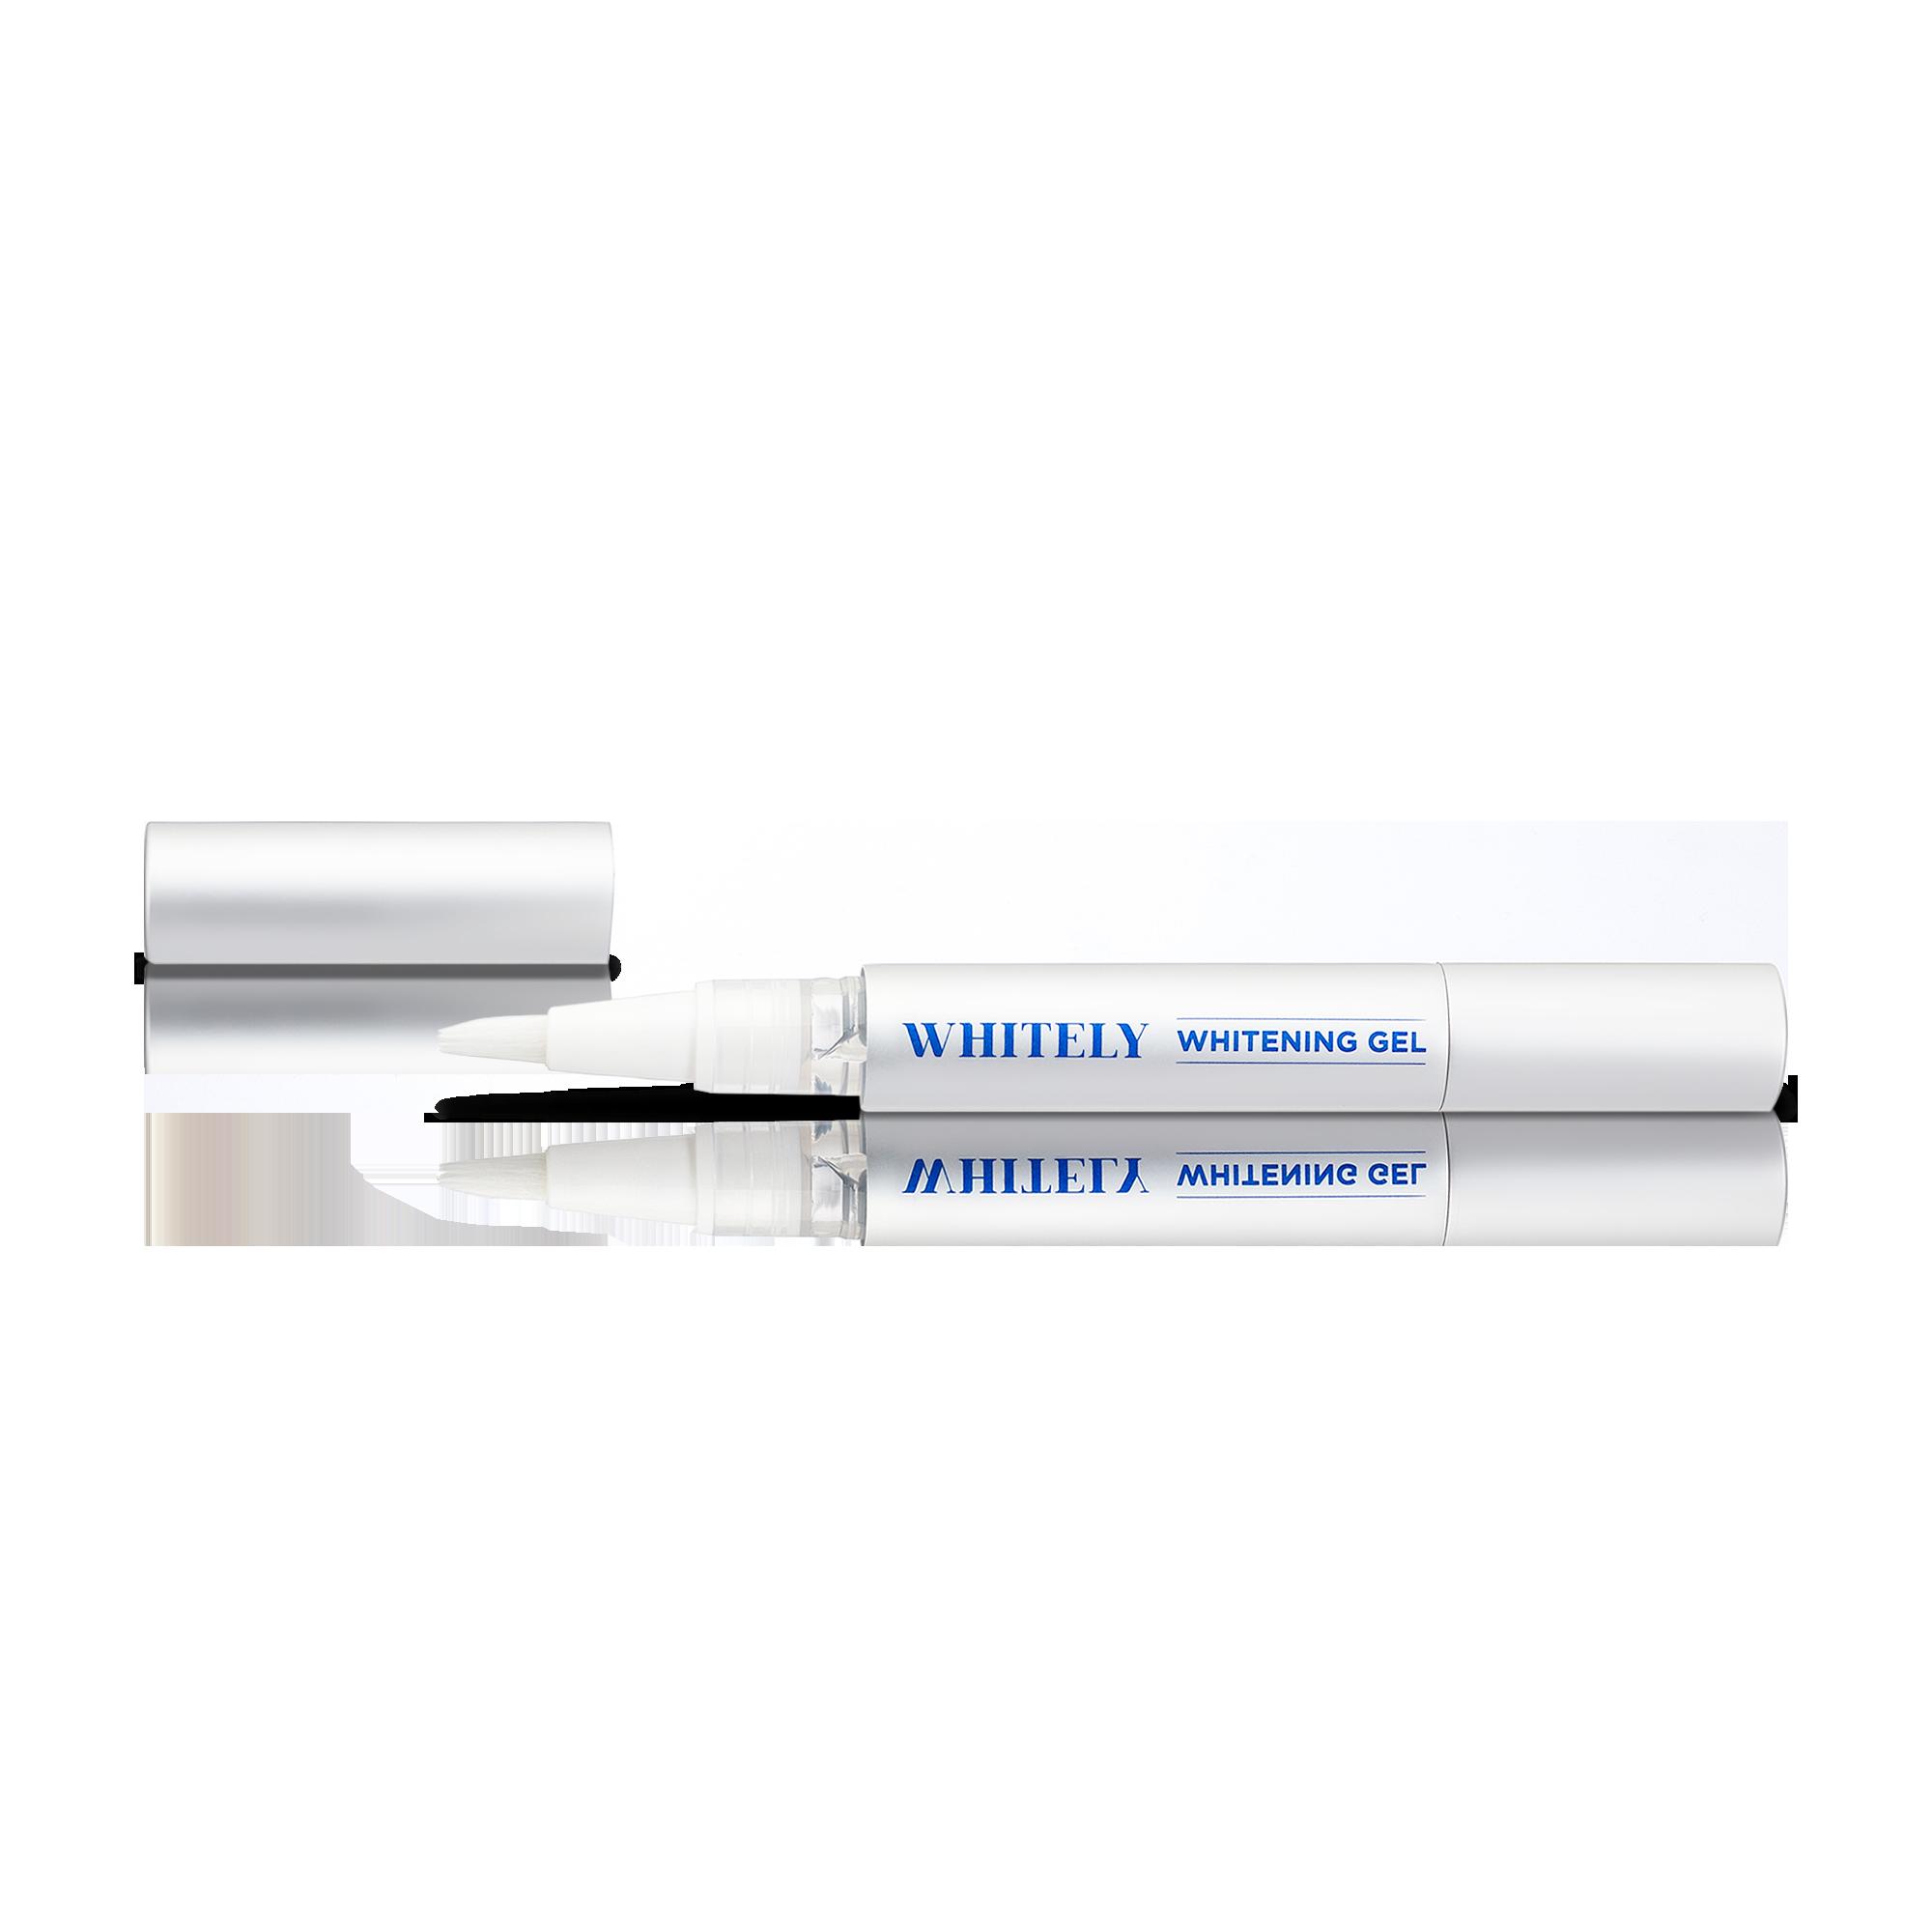 whitening gel product image